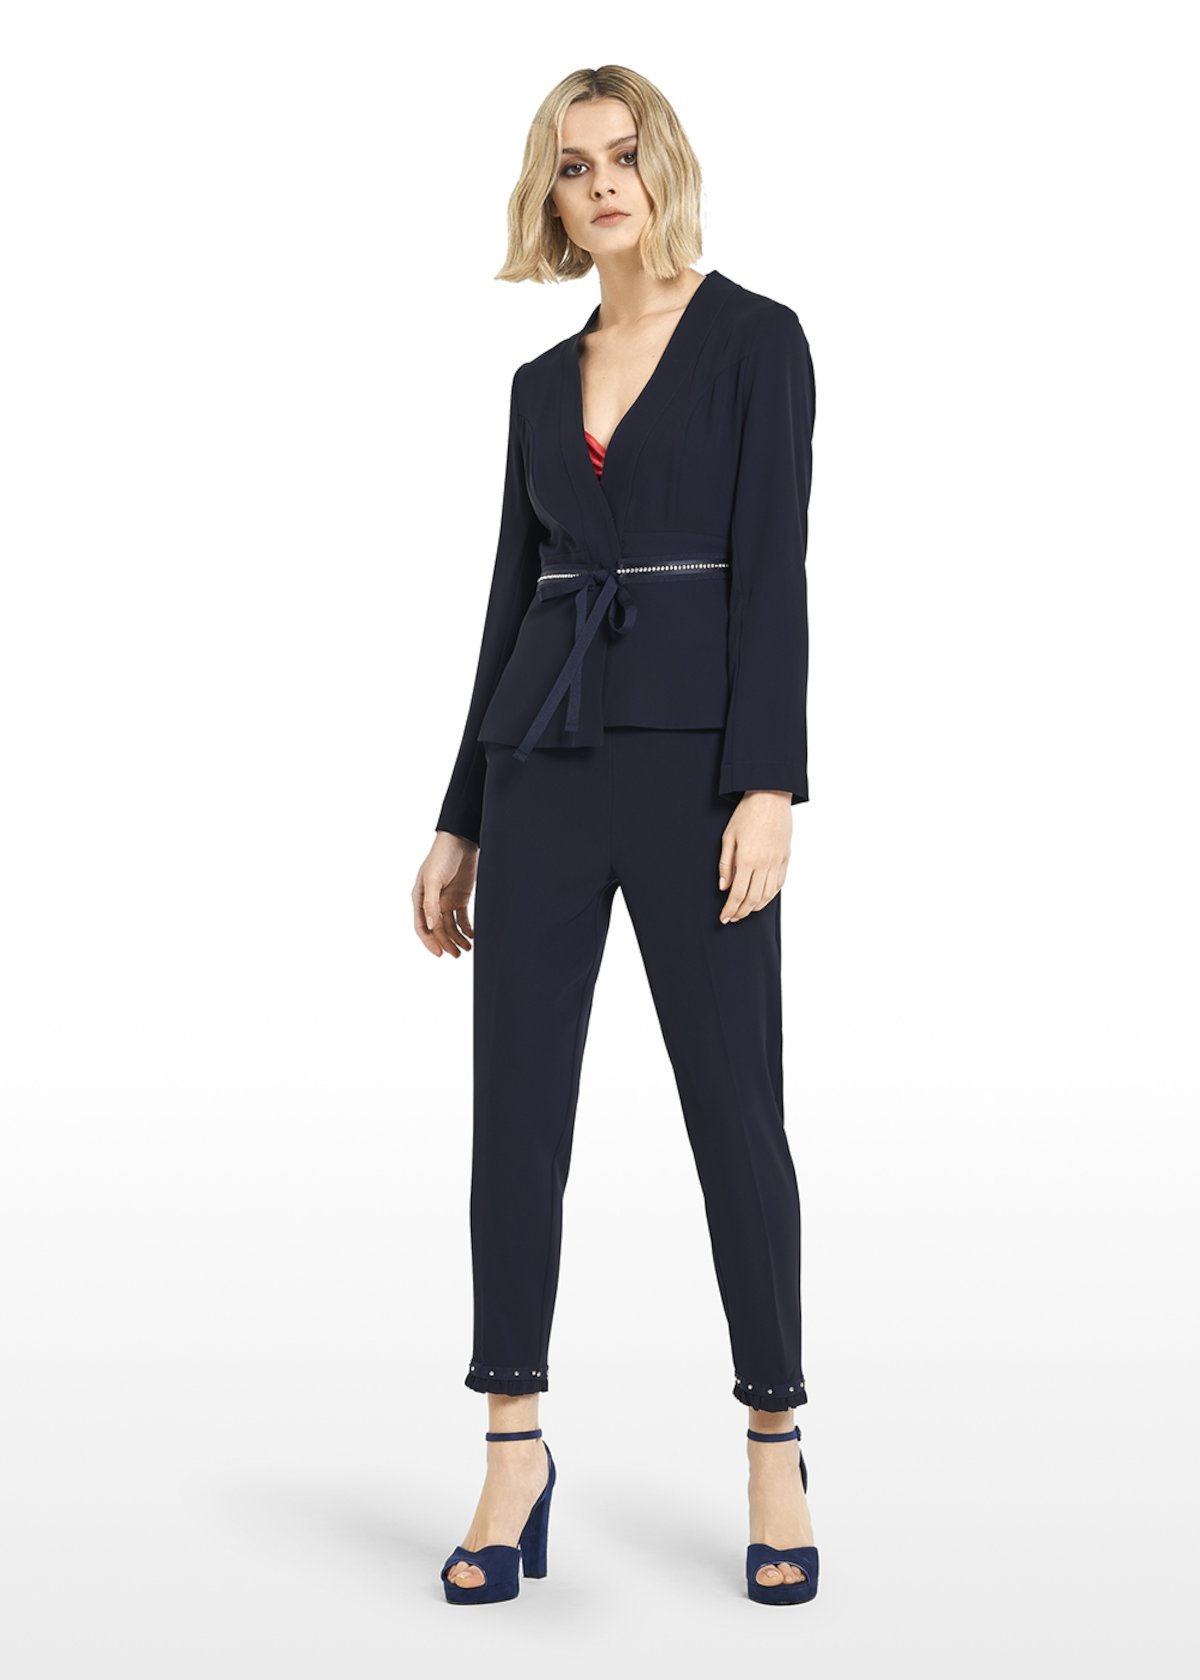 Gilda jacket cadi fabric with removable belt - Medium Blue - Woman - Category image